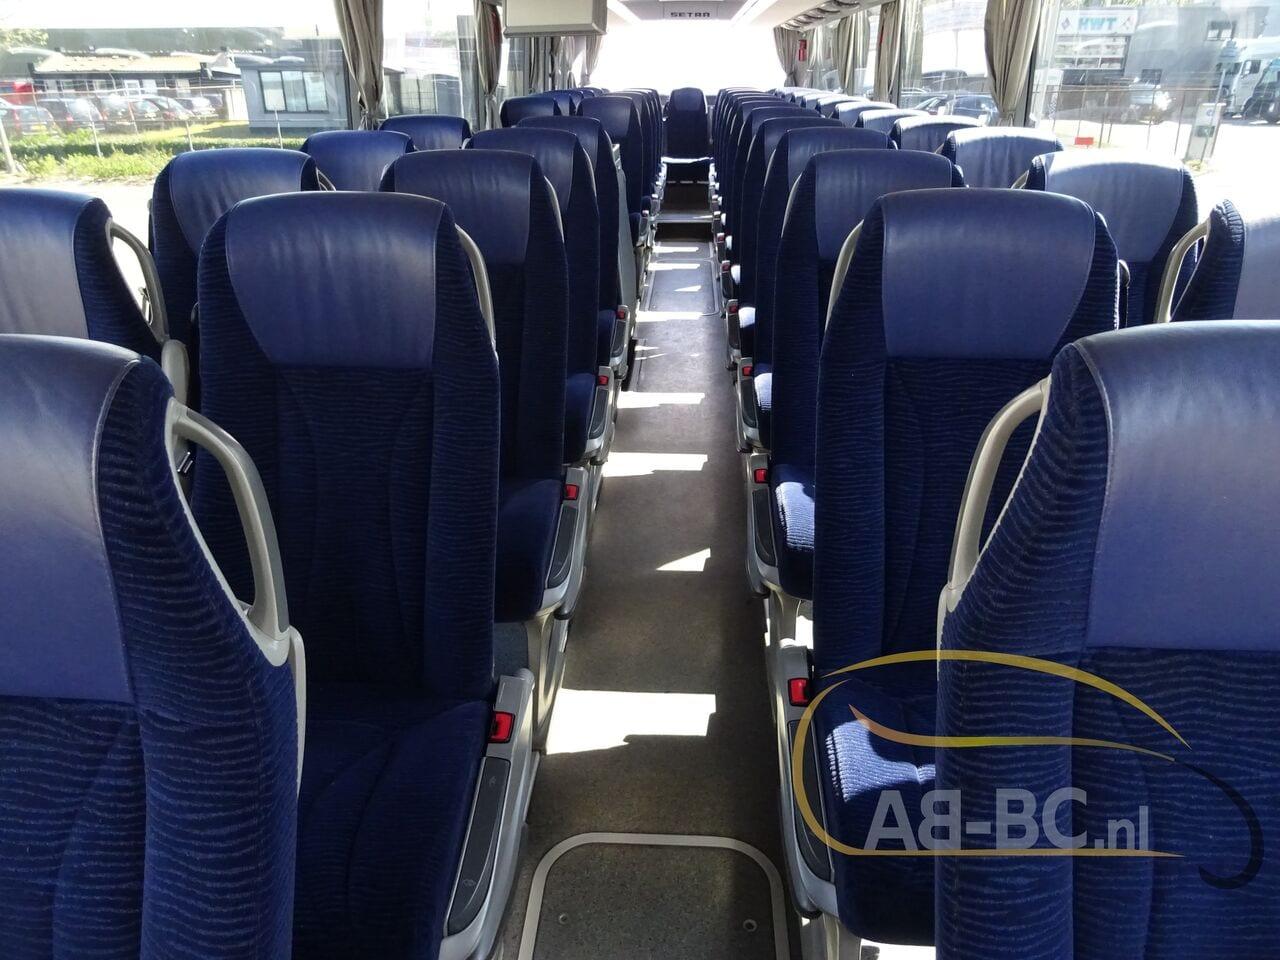 coach-busSETRA-S415-GT-HD-FINAL-EDITION-51-SEATS-LIFTBUS---1620382036123850702_big_8e60c24d5b62d704293c38e0c76e3365--21050713010665719300